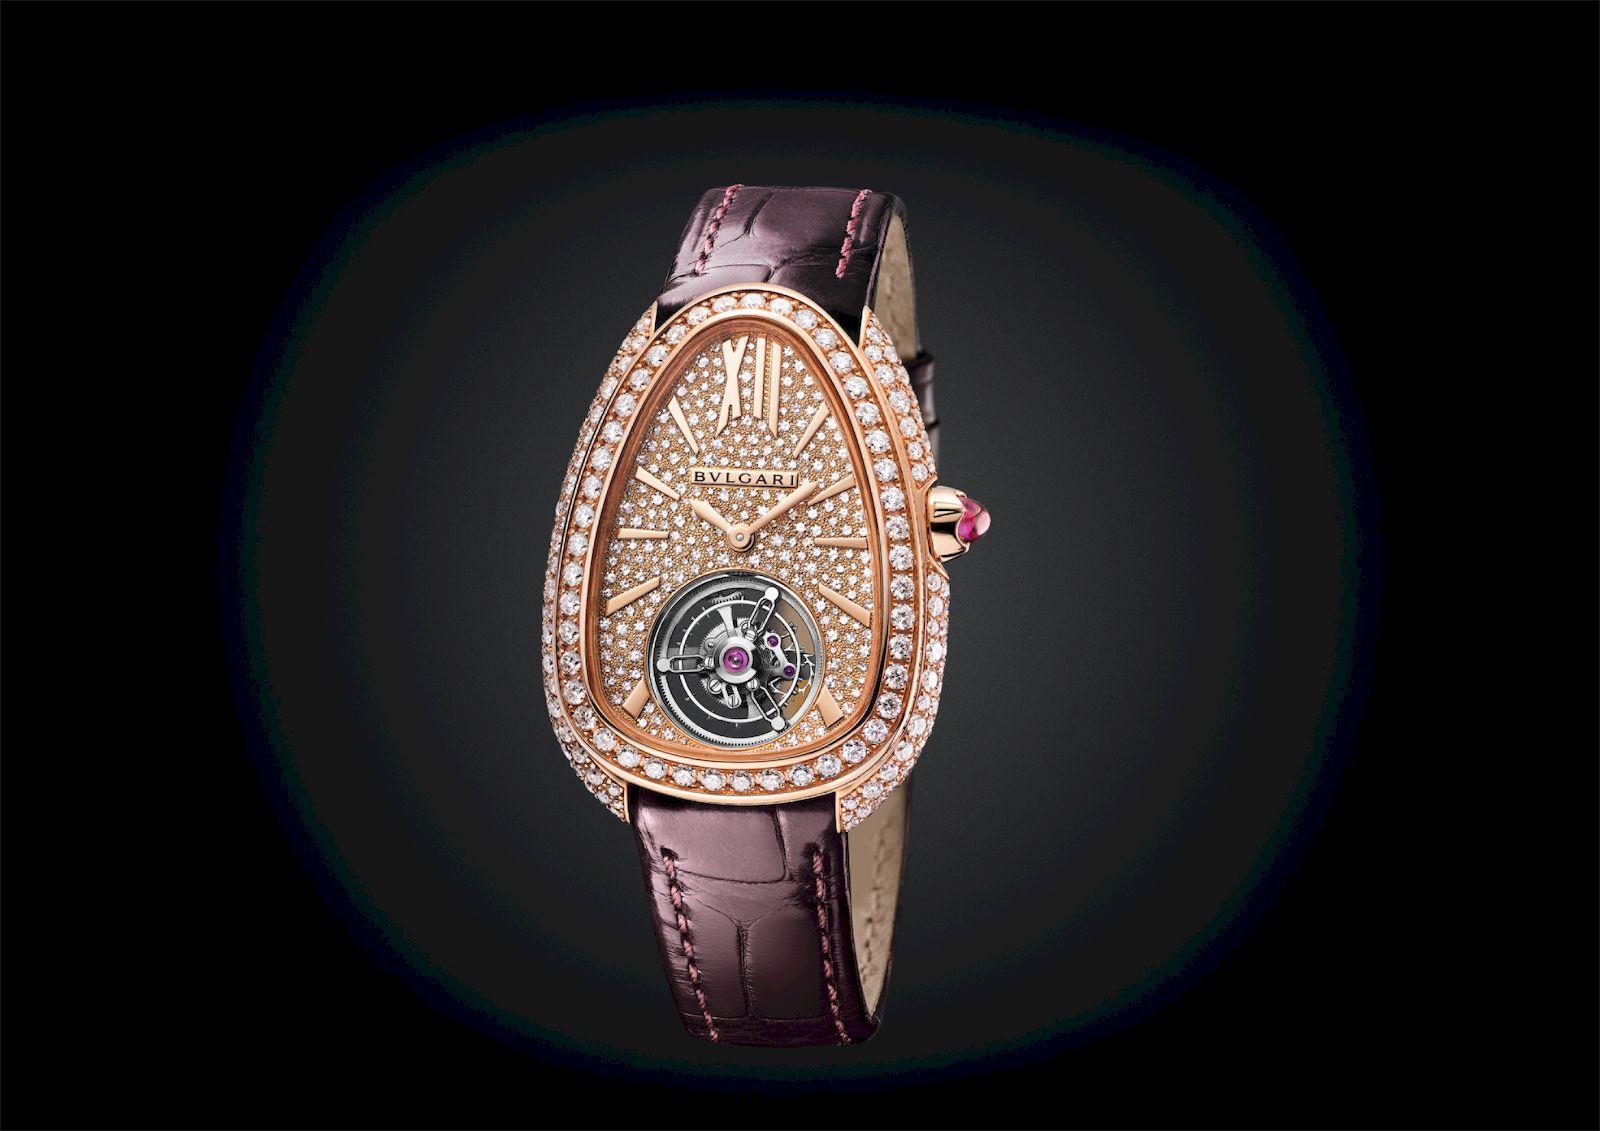 The Bvlgari Serpenti Seduttori Tourbillon is the world's smallest women's tourbillon timepiece